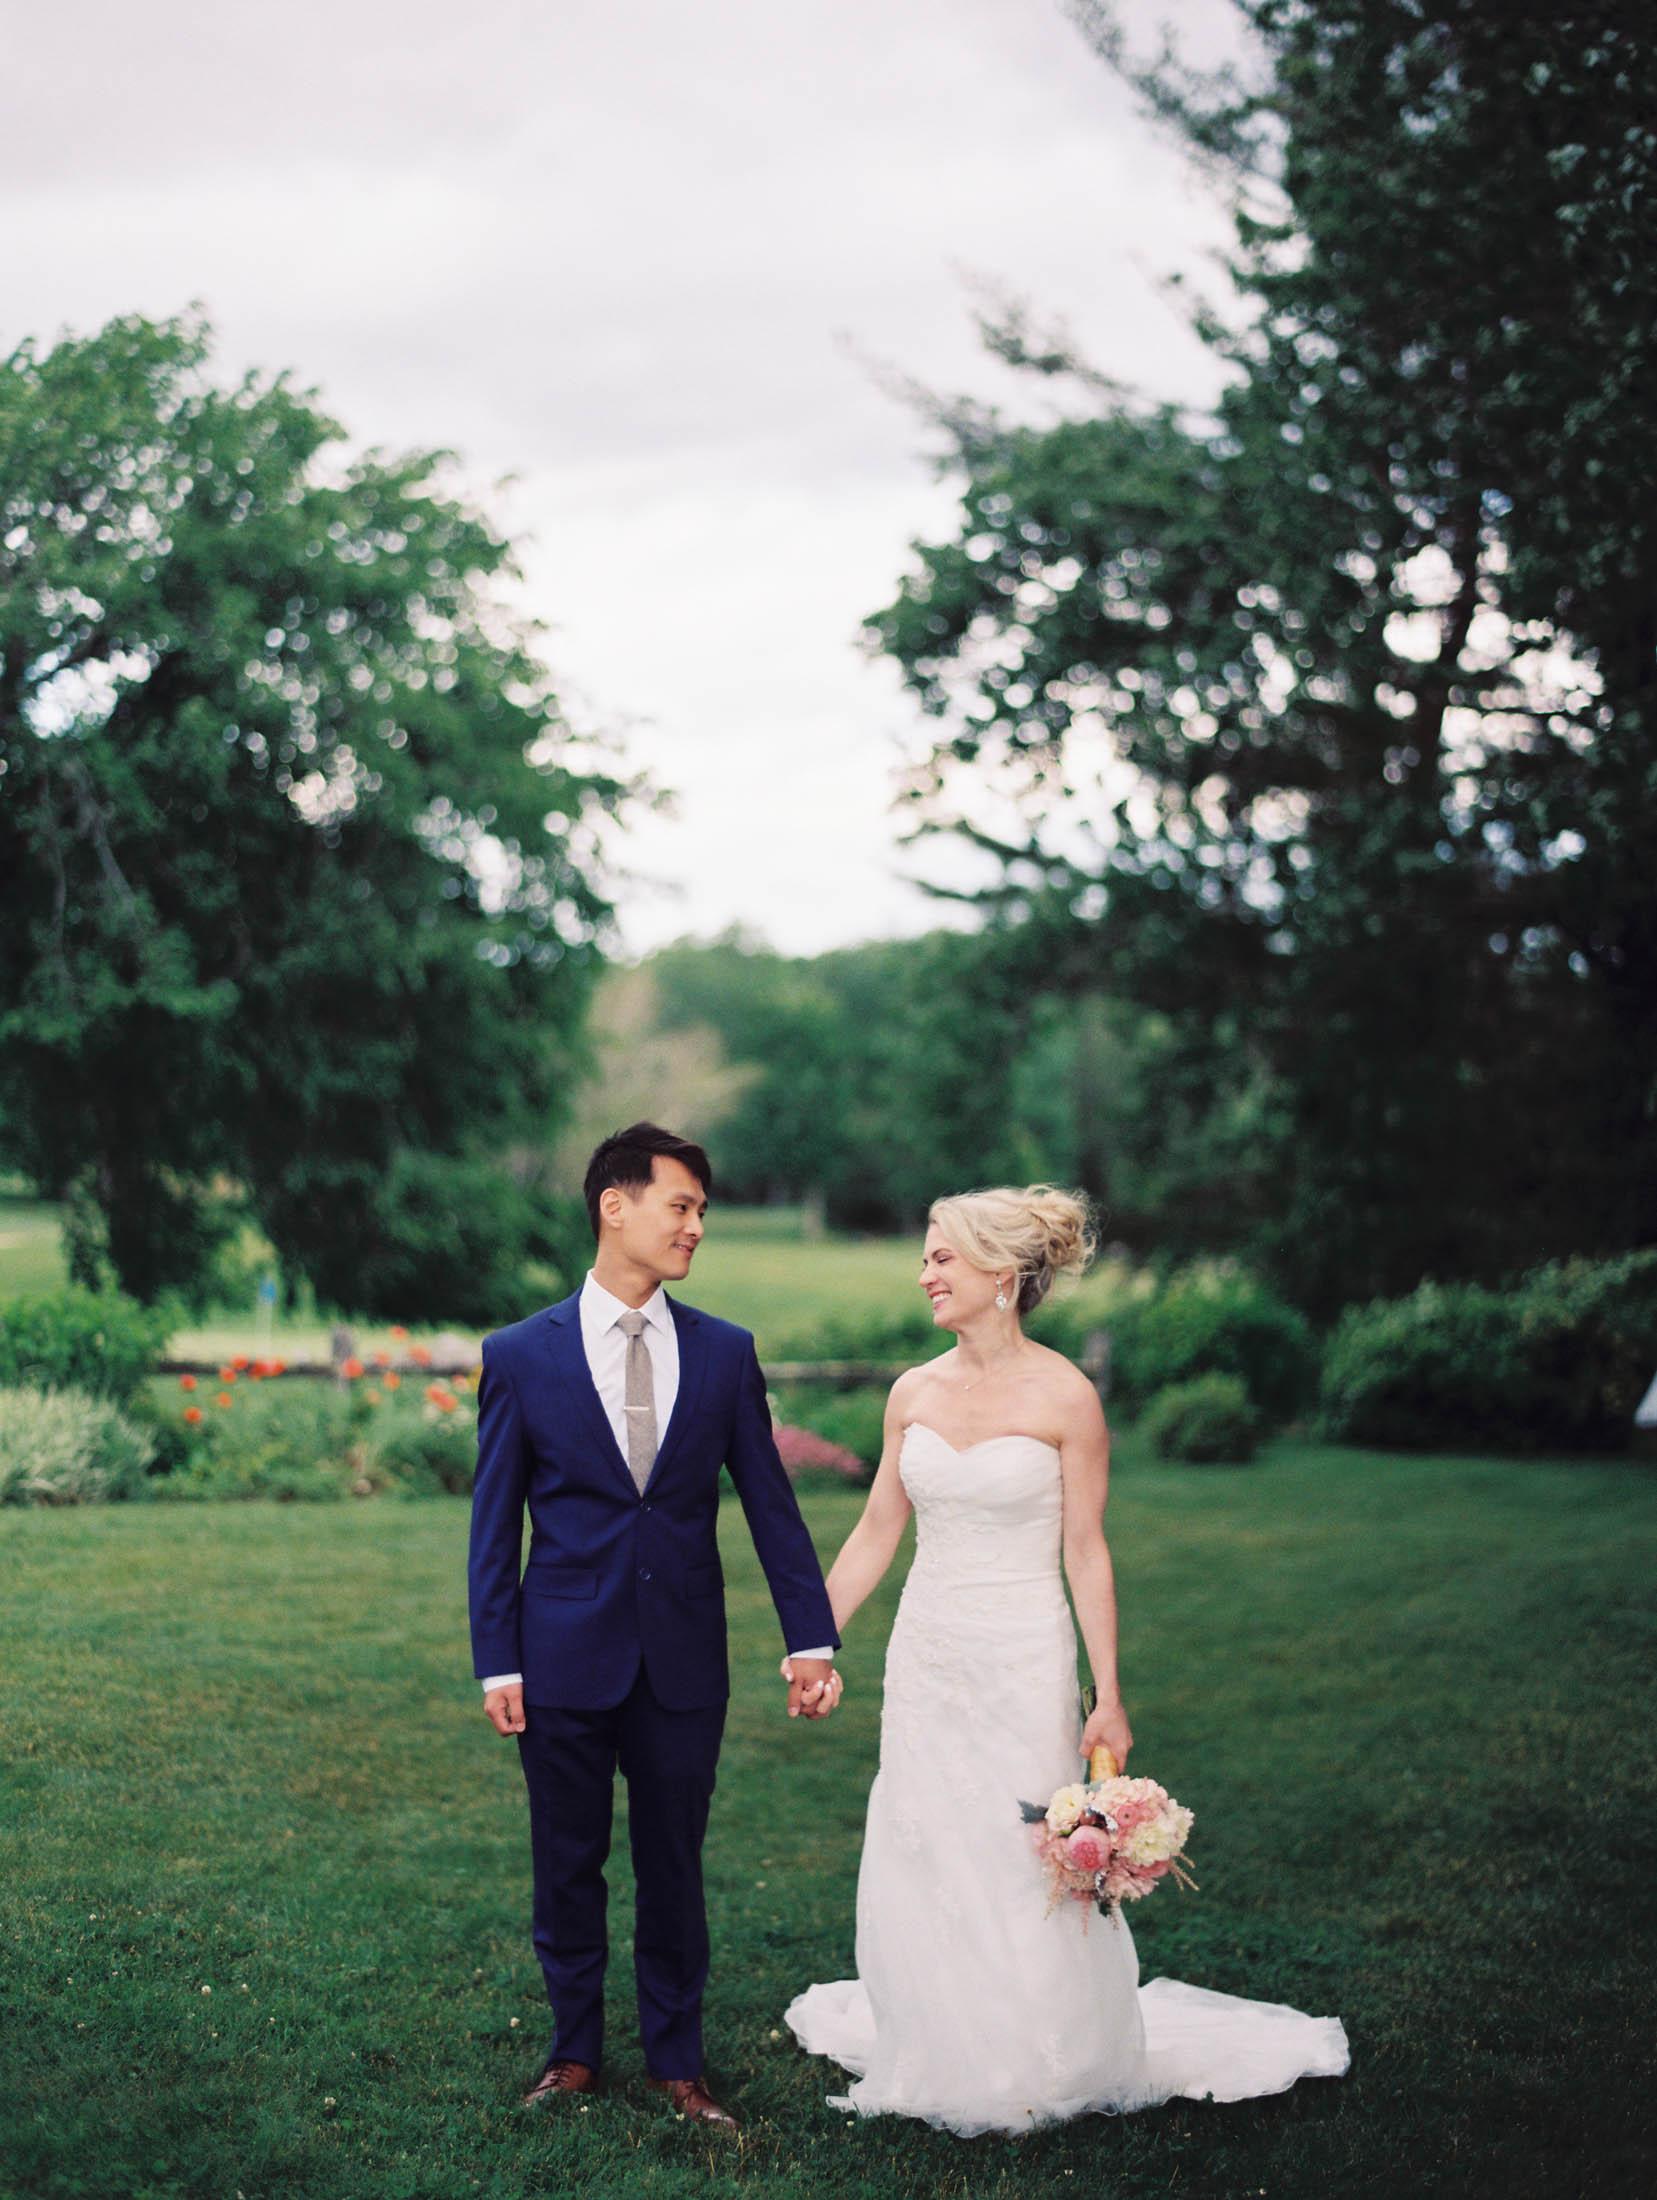 Blissful-Meadows-wedding-14.jpg